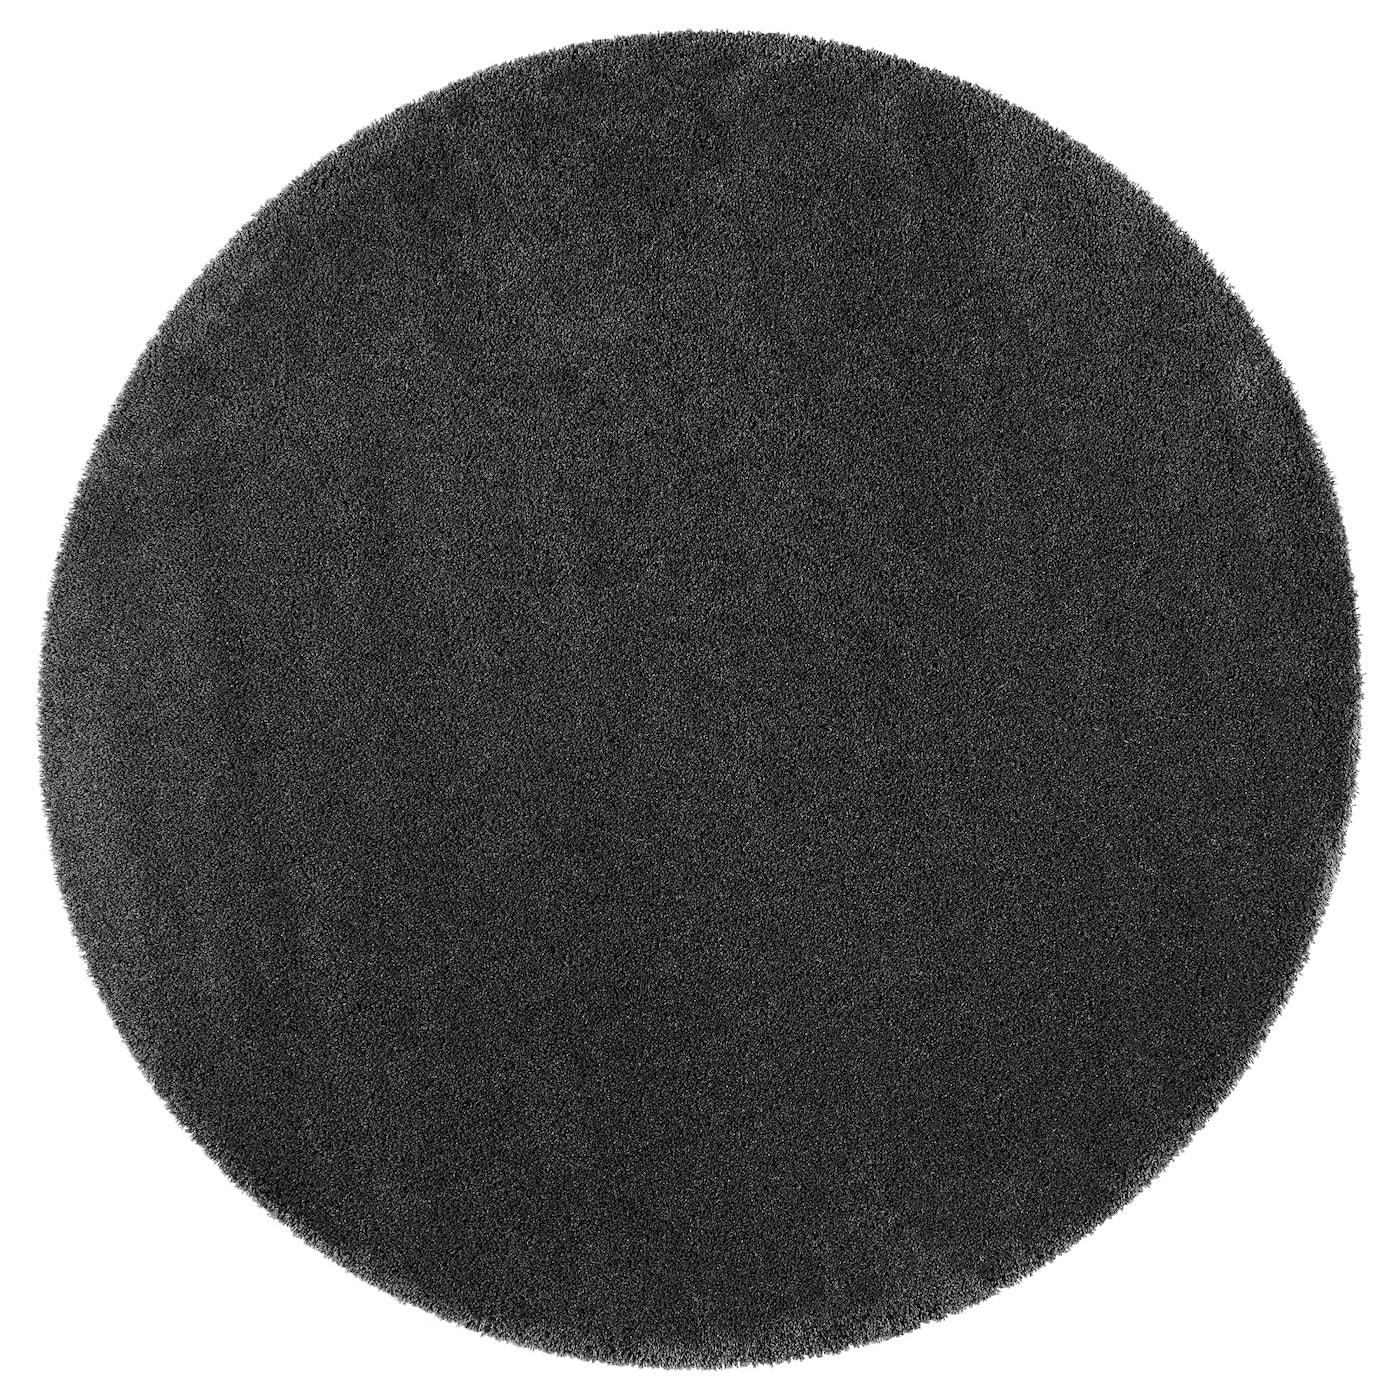 Dum Alfombra Pelo Largo Gris Oscuro 195 Cm Ikea